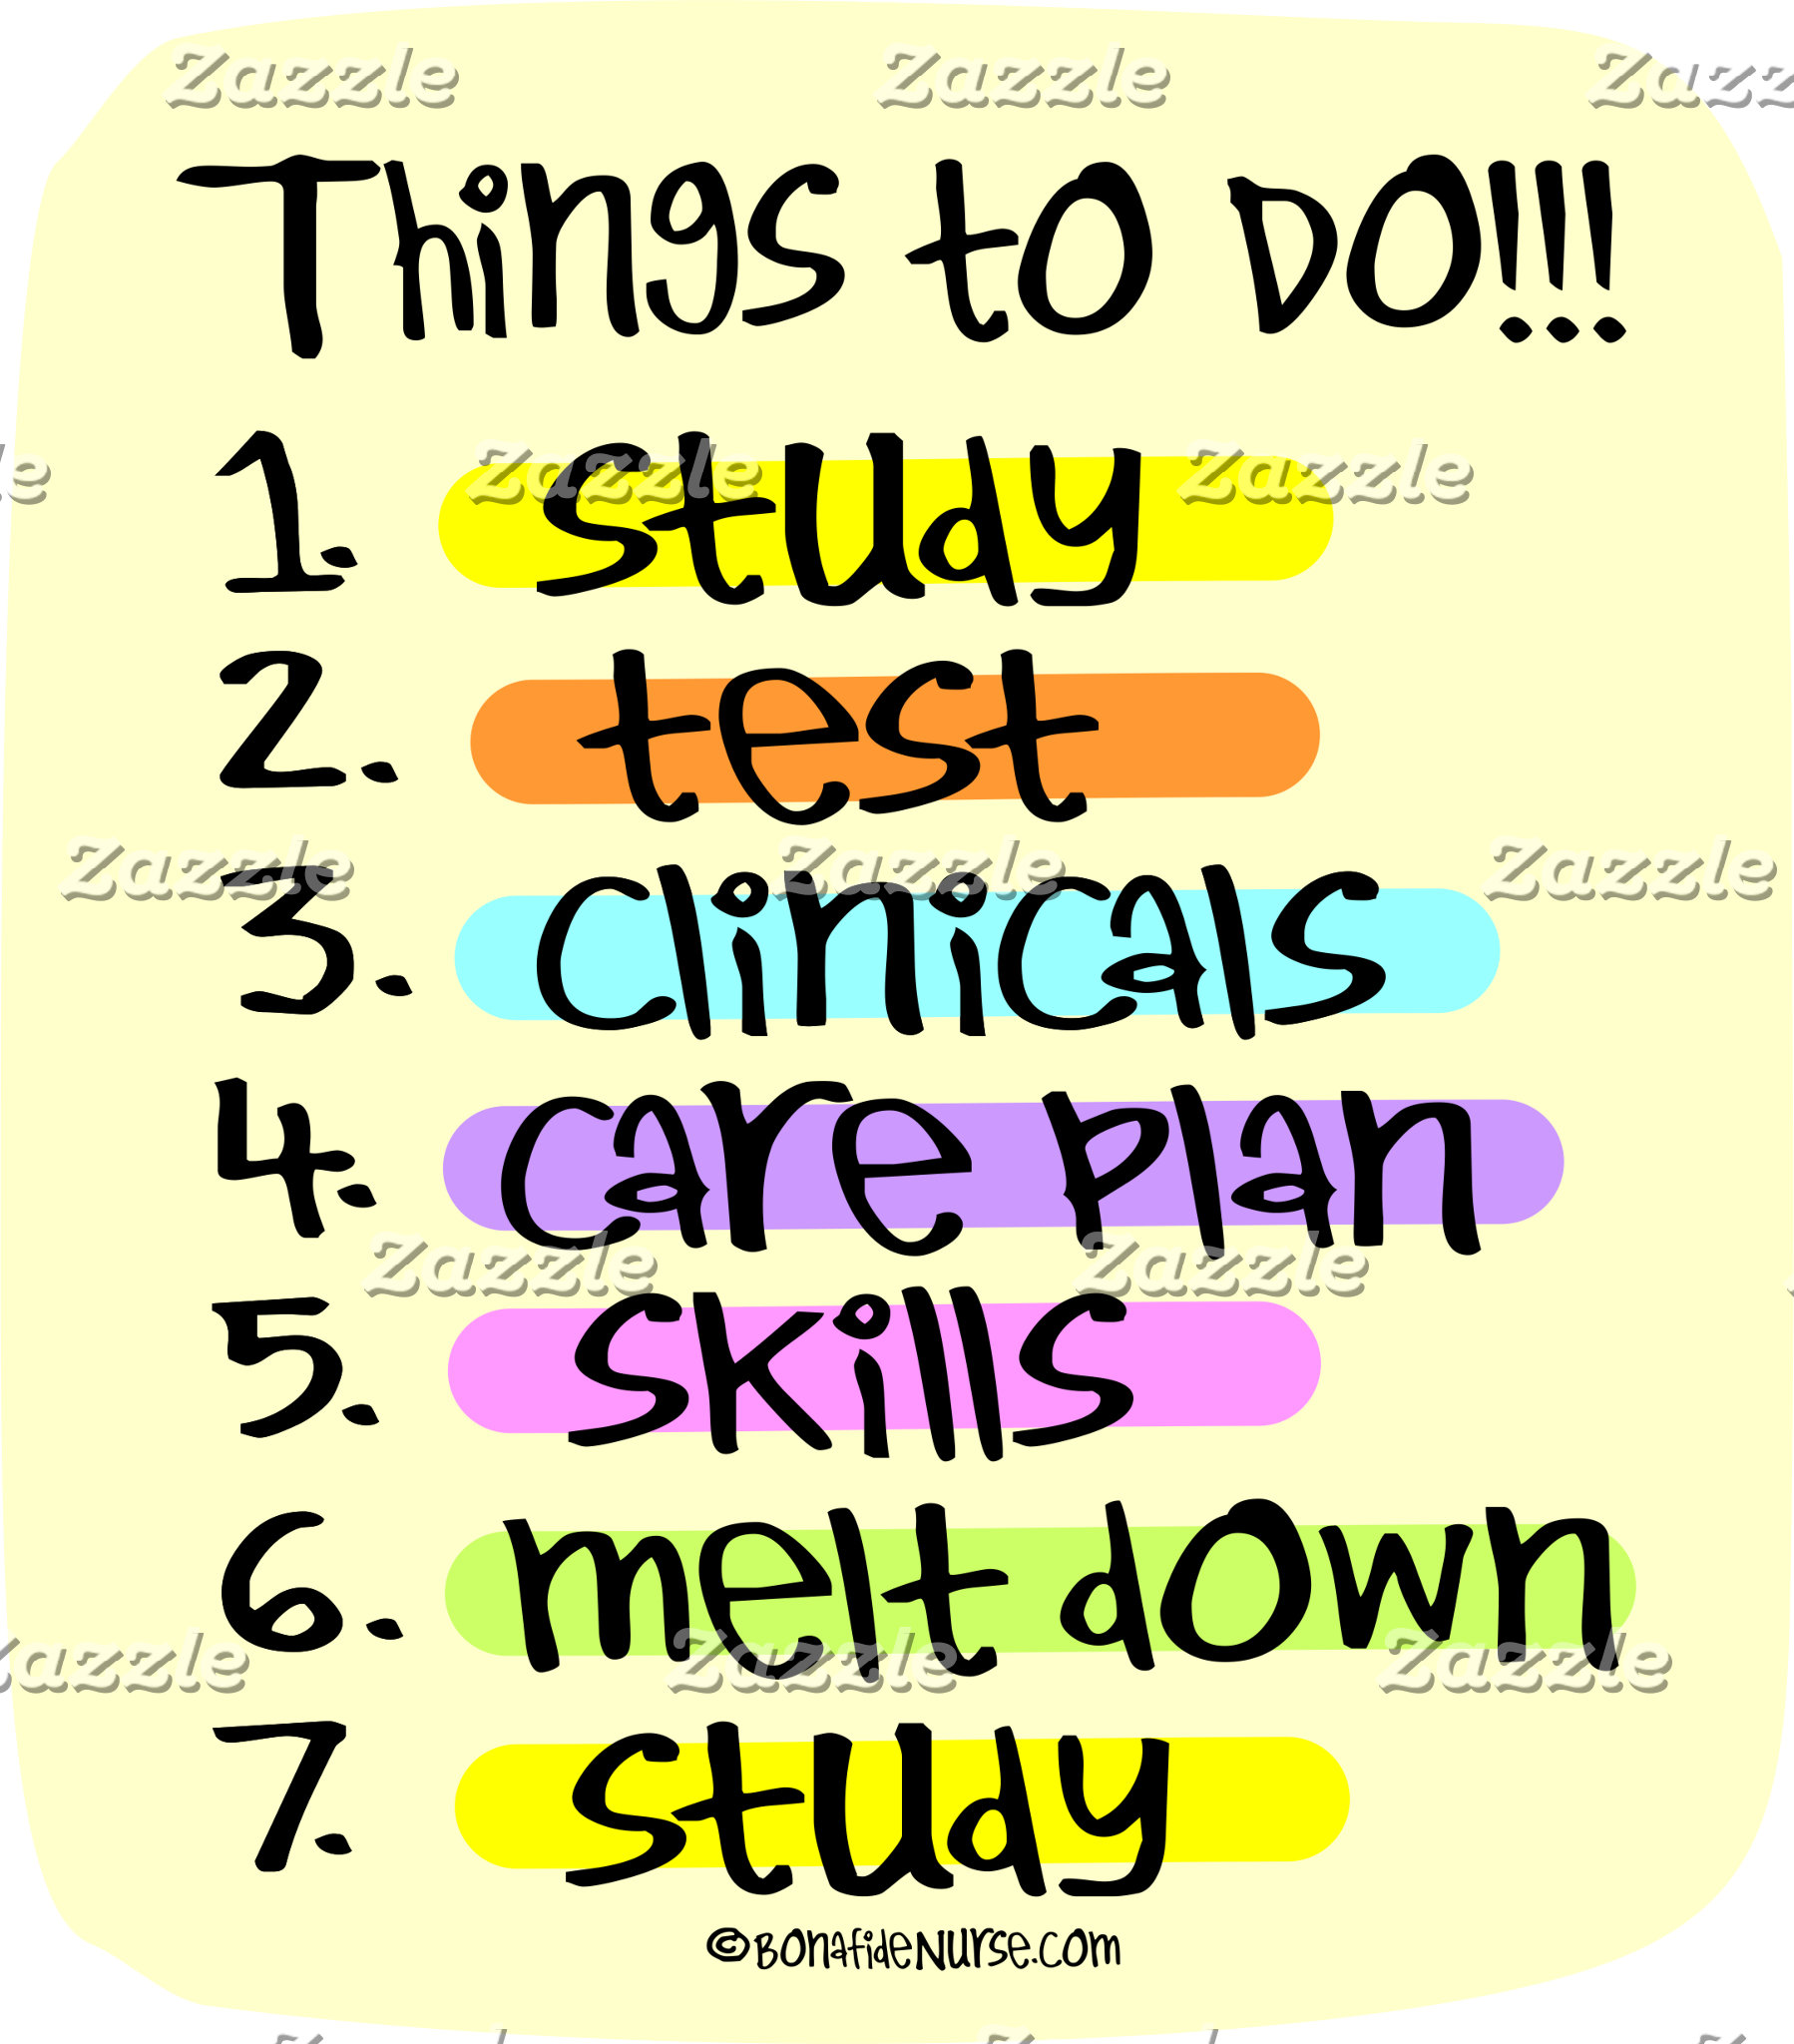 Student Nurse To Do List